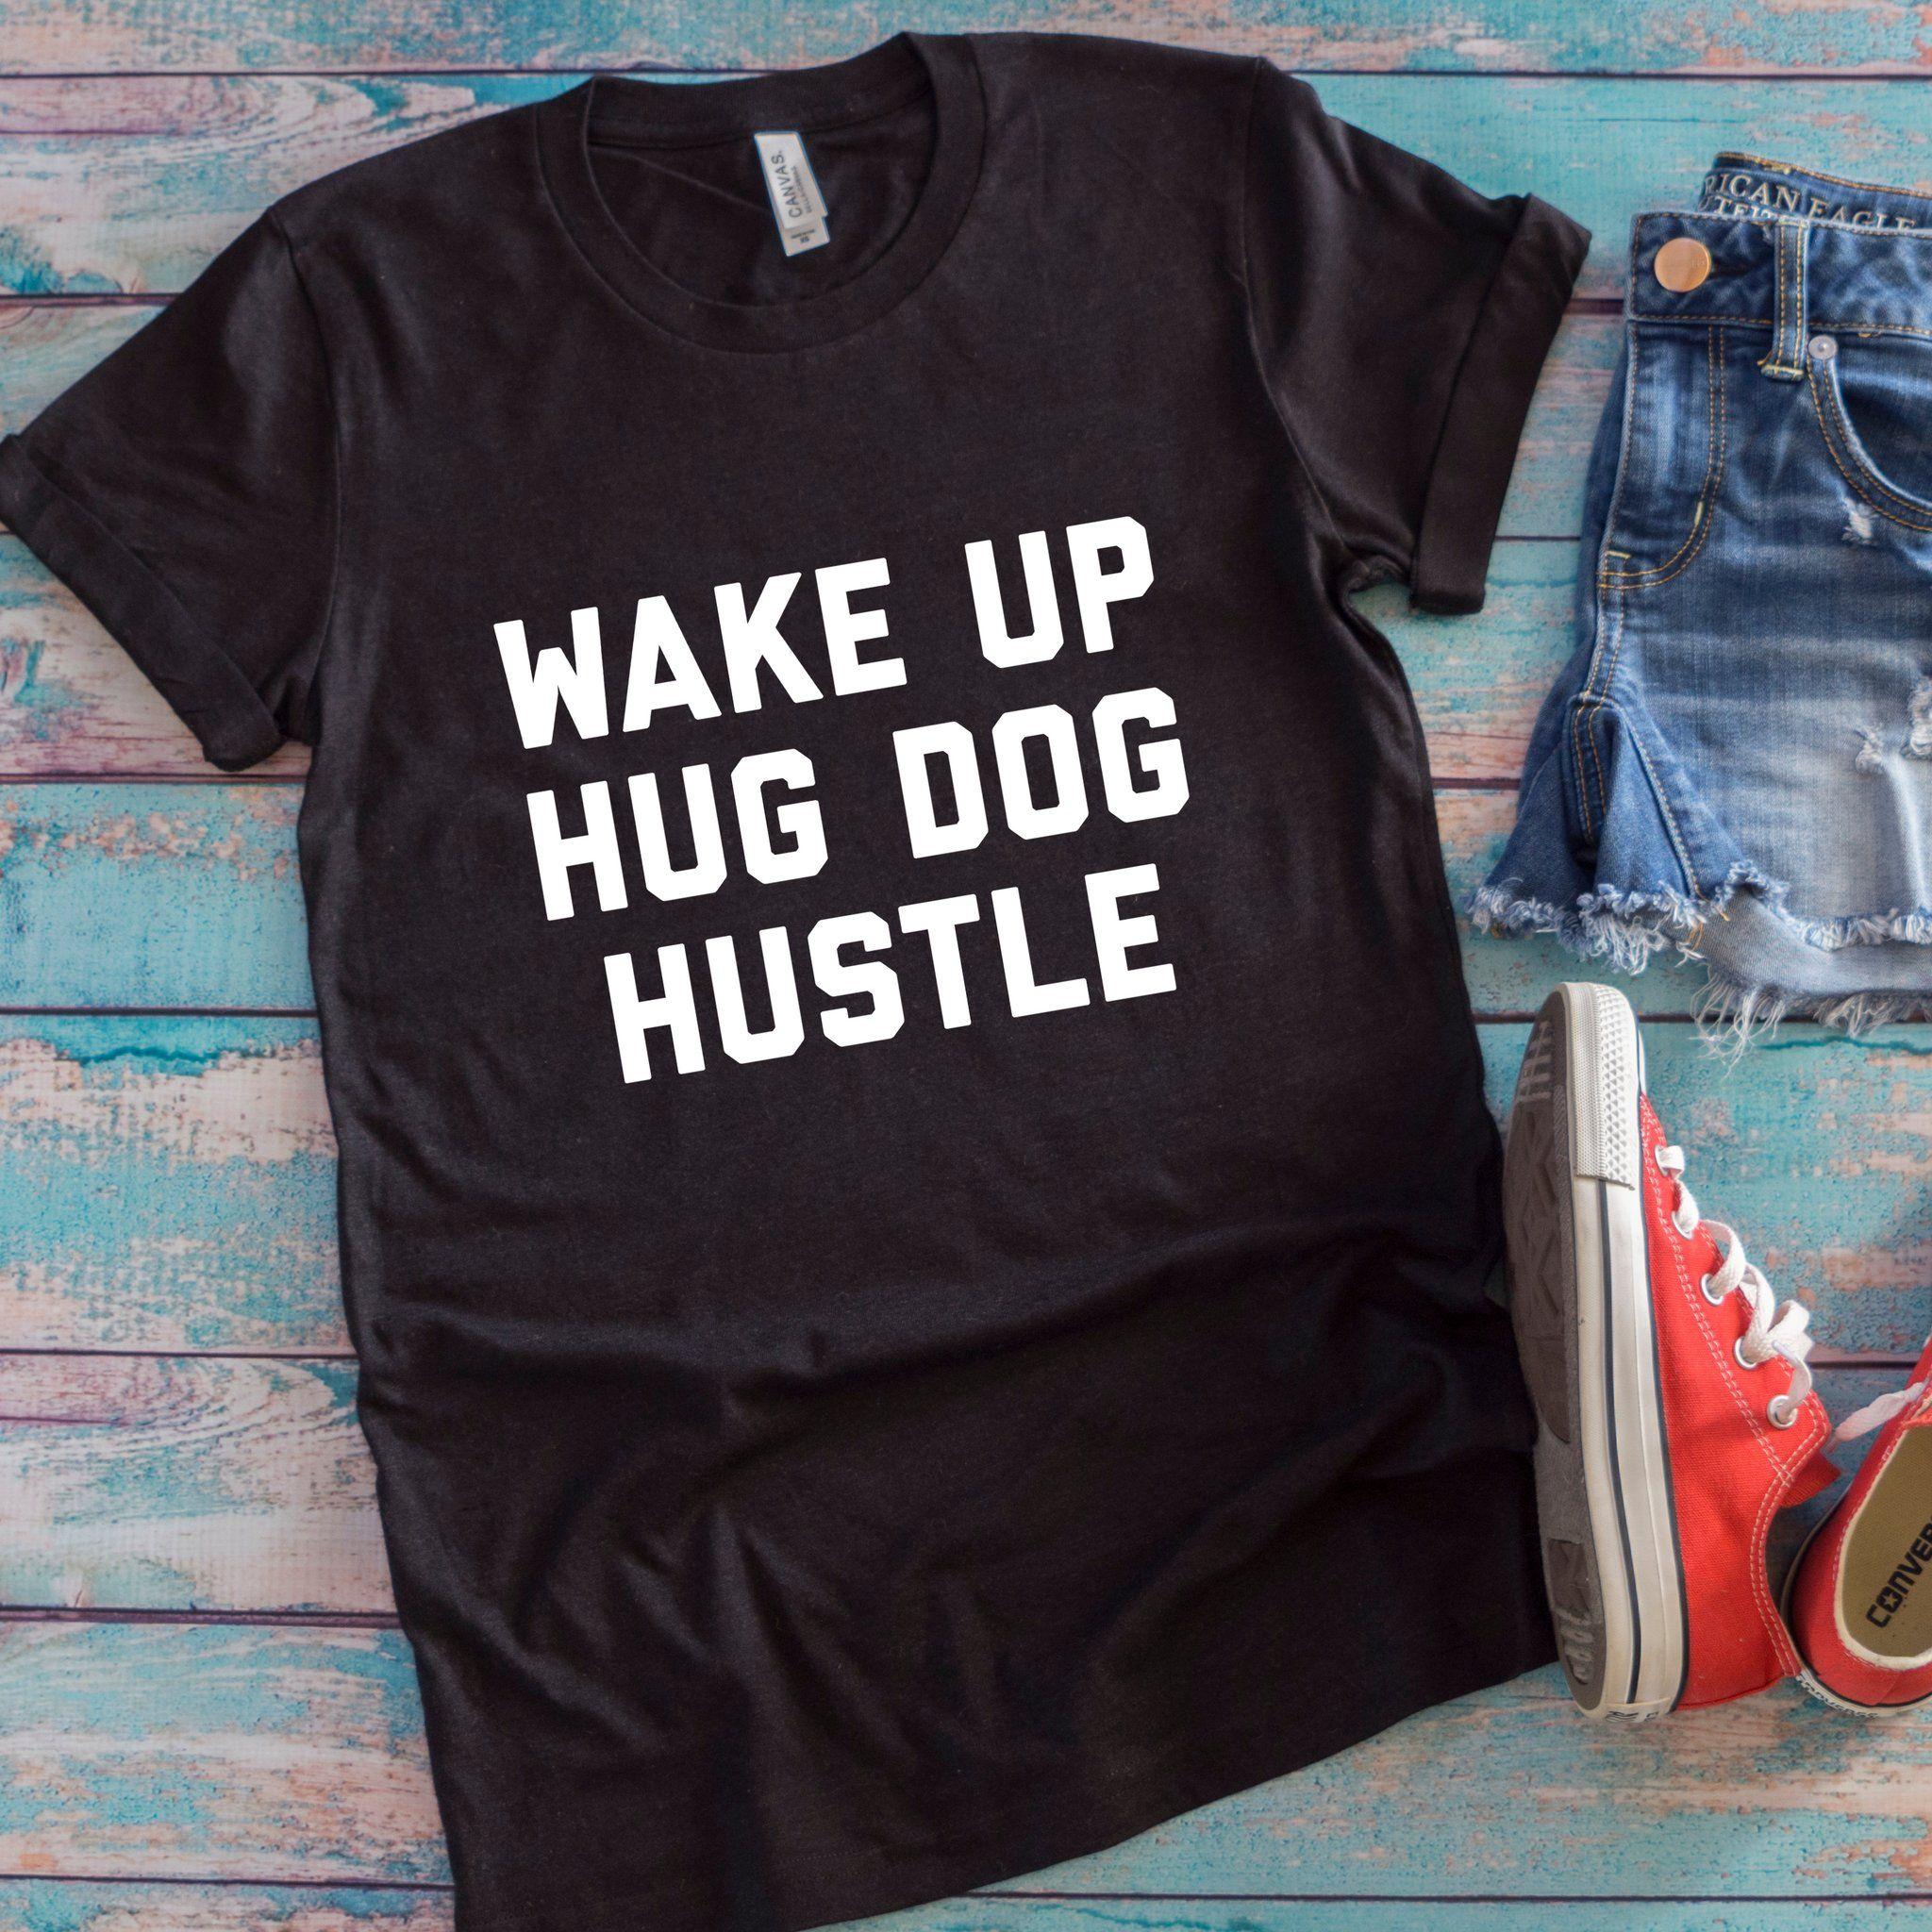 Hustle Unisex T Shirt Ftw Pop Pinterest Pop Dog Mom Gifts And